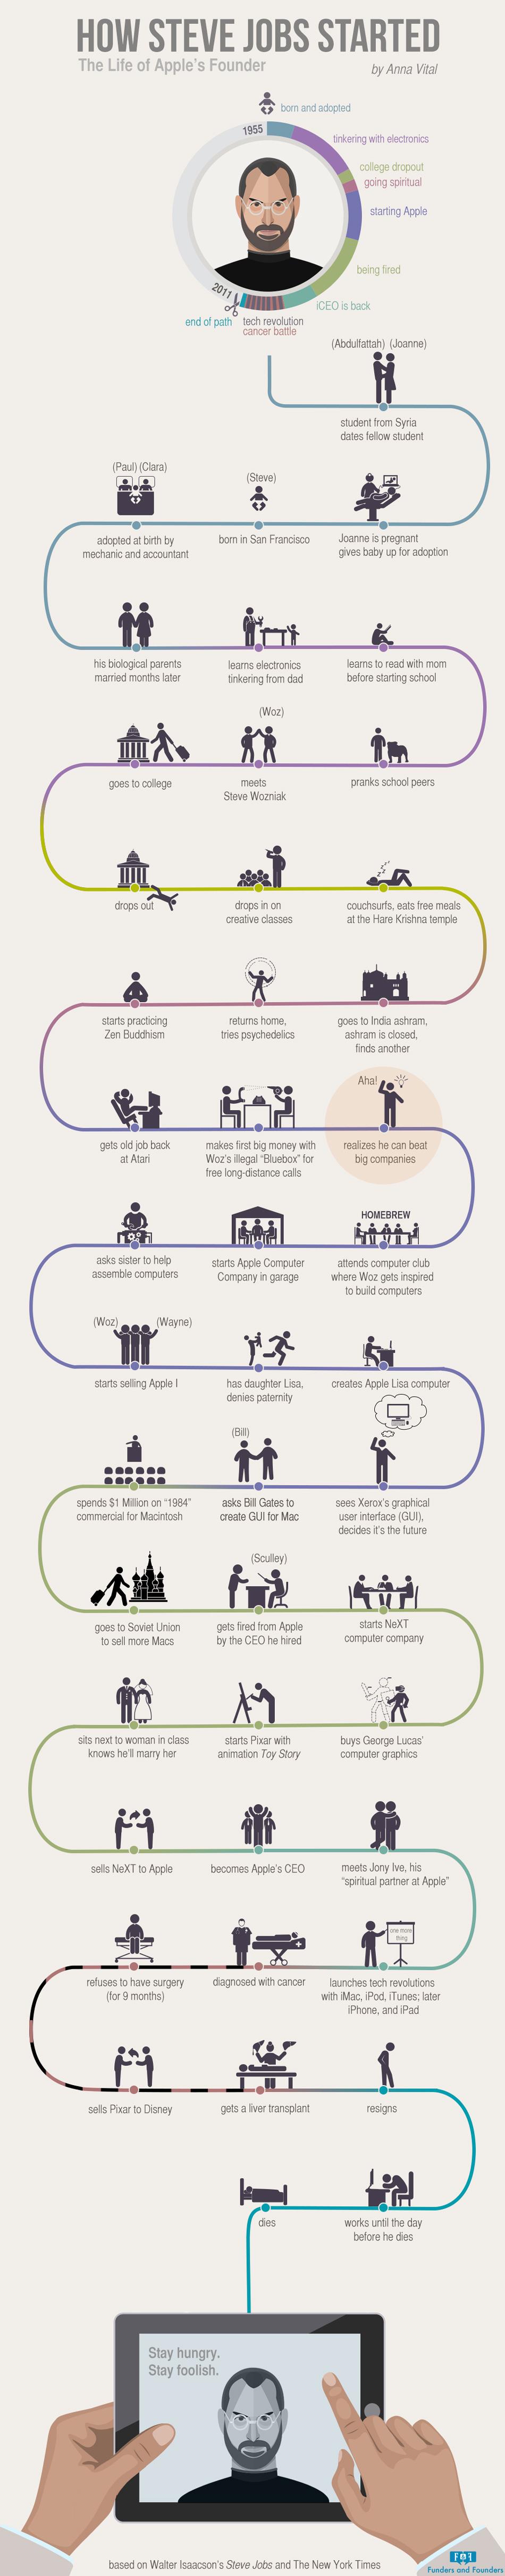 How-Steve-Jobs-Started-apple-founder-infographic